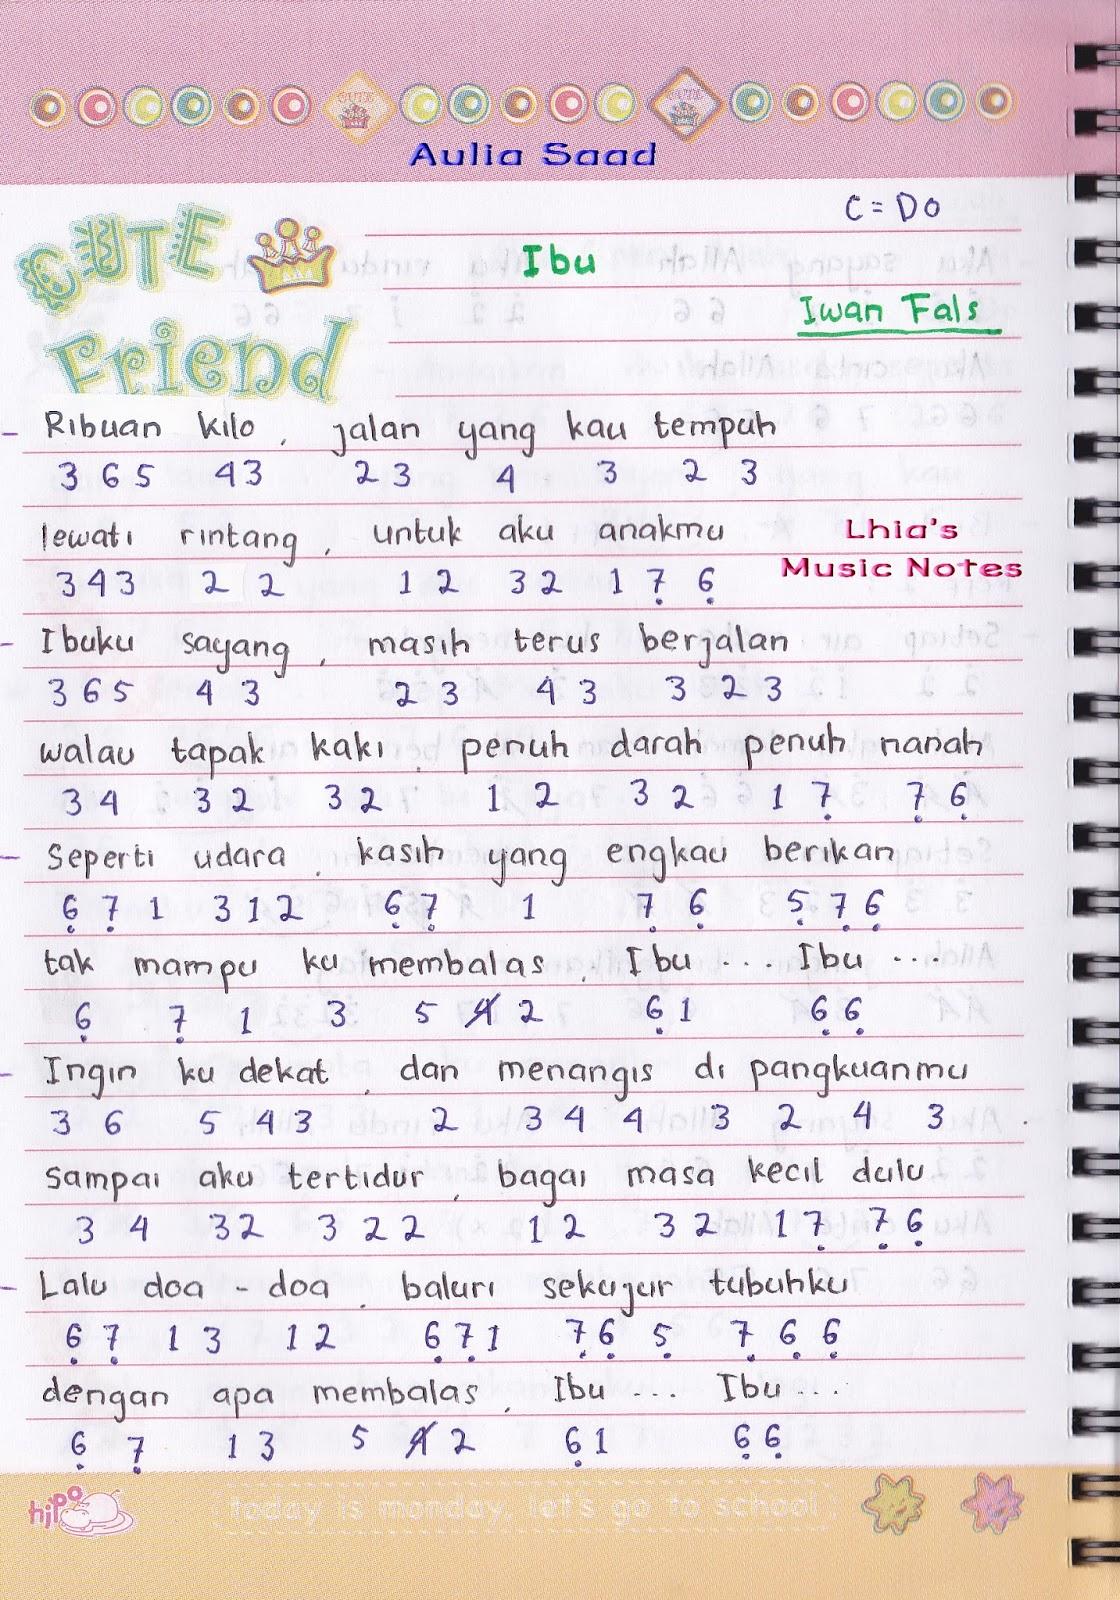 Not Angka : Iwan Fals – Ibu | Lhia's Music Notes